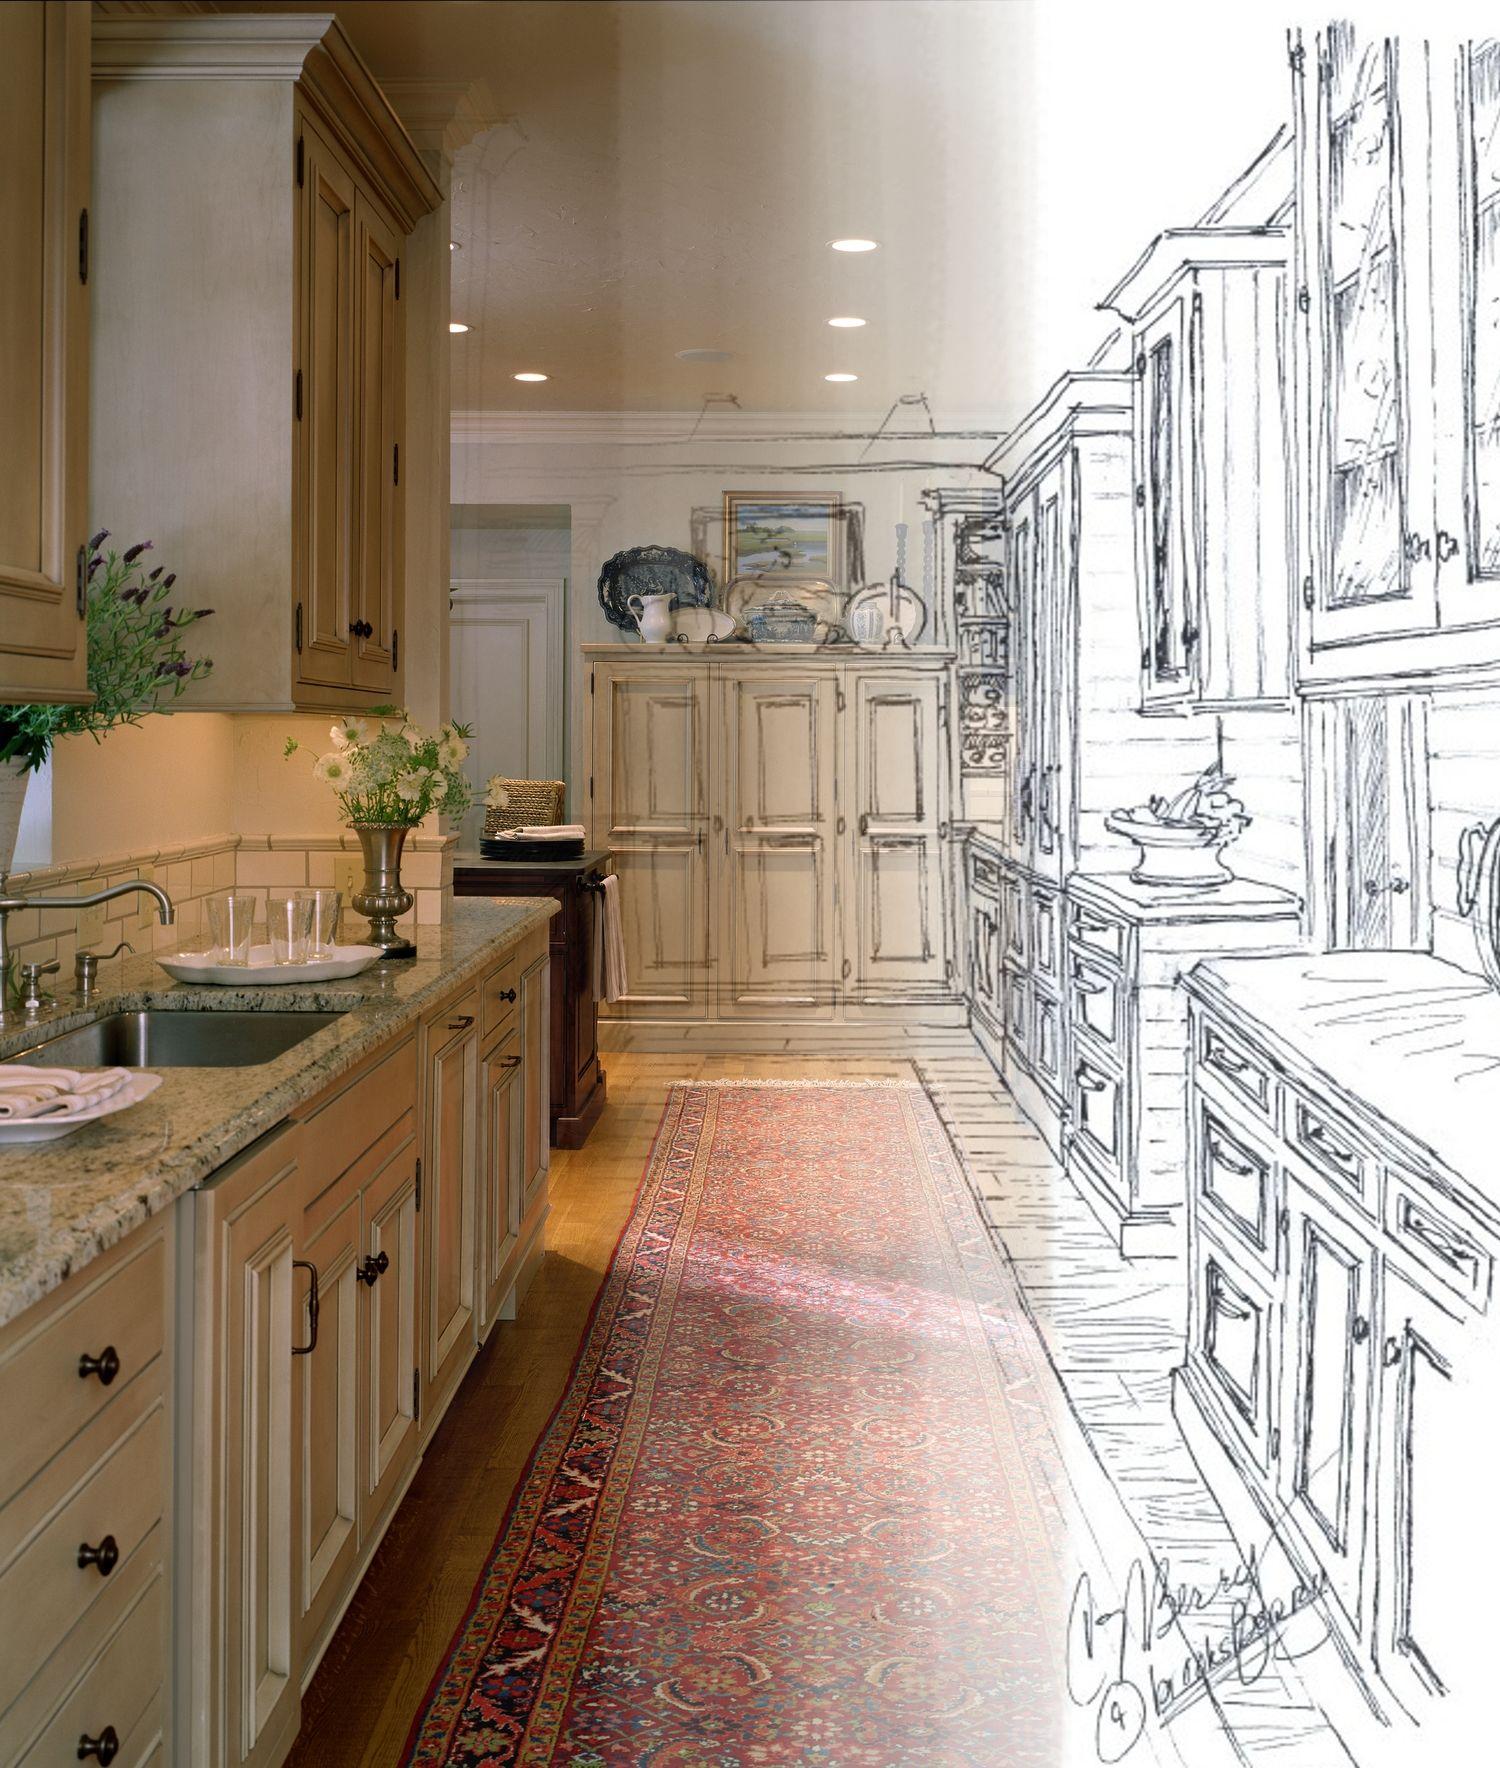 brooksBerry & Associates STL Kitchen & Bath Design | brooksBerry ...